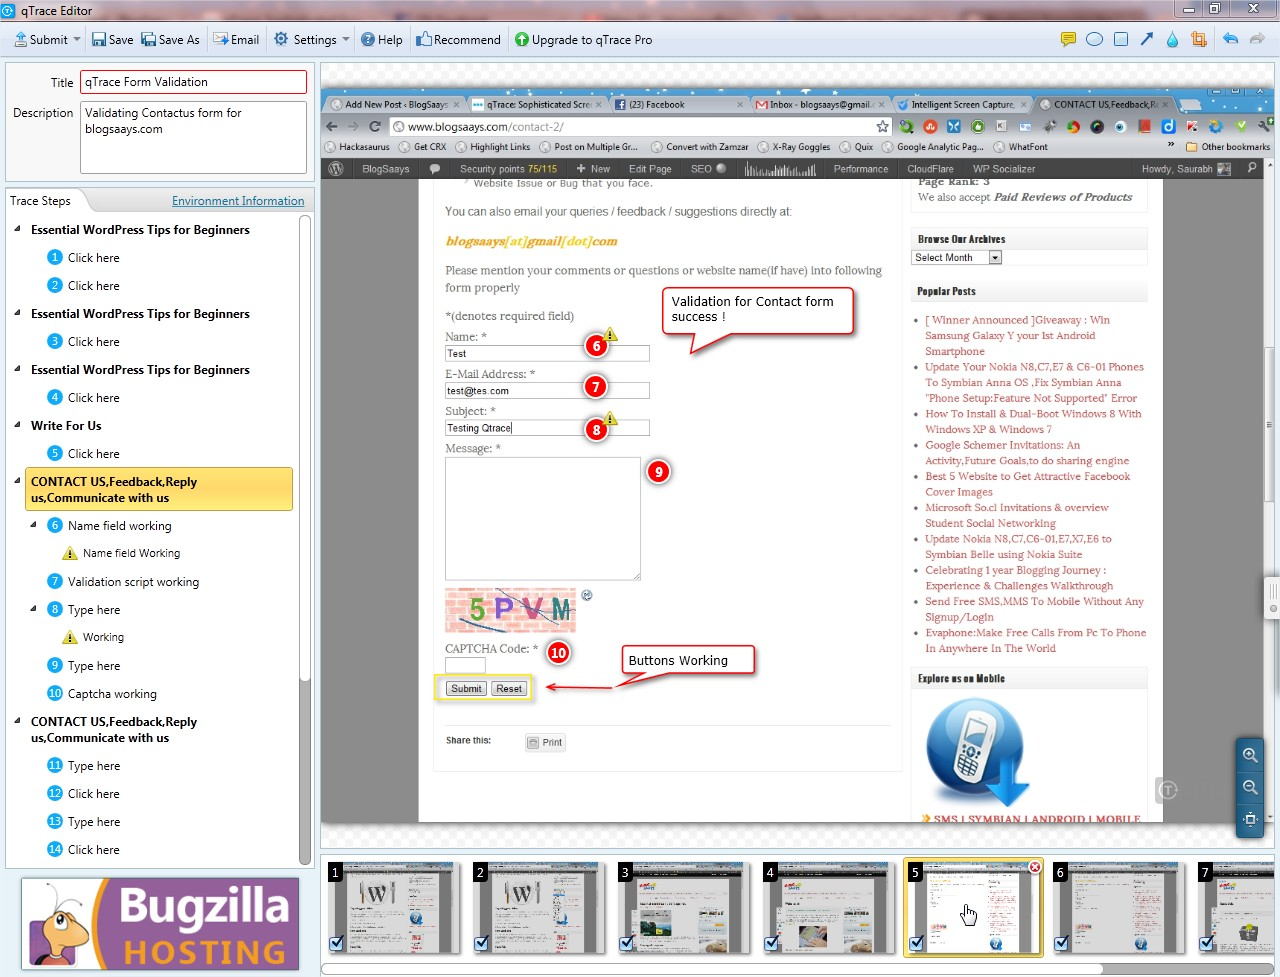 qTrace Editor testing bug report generation